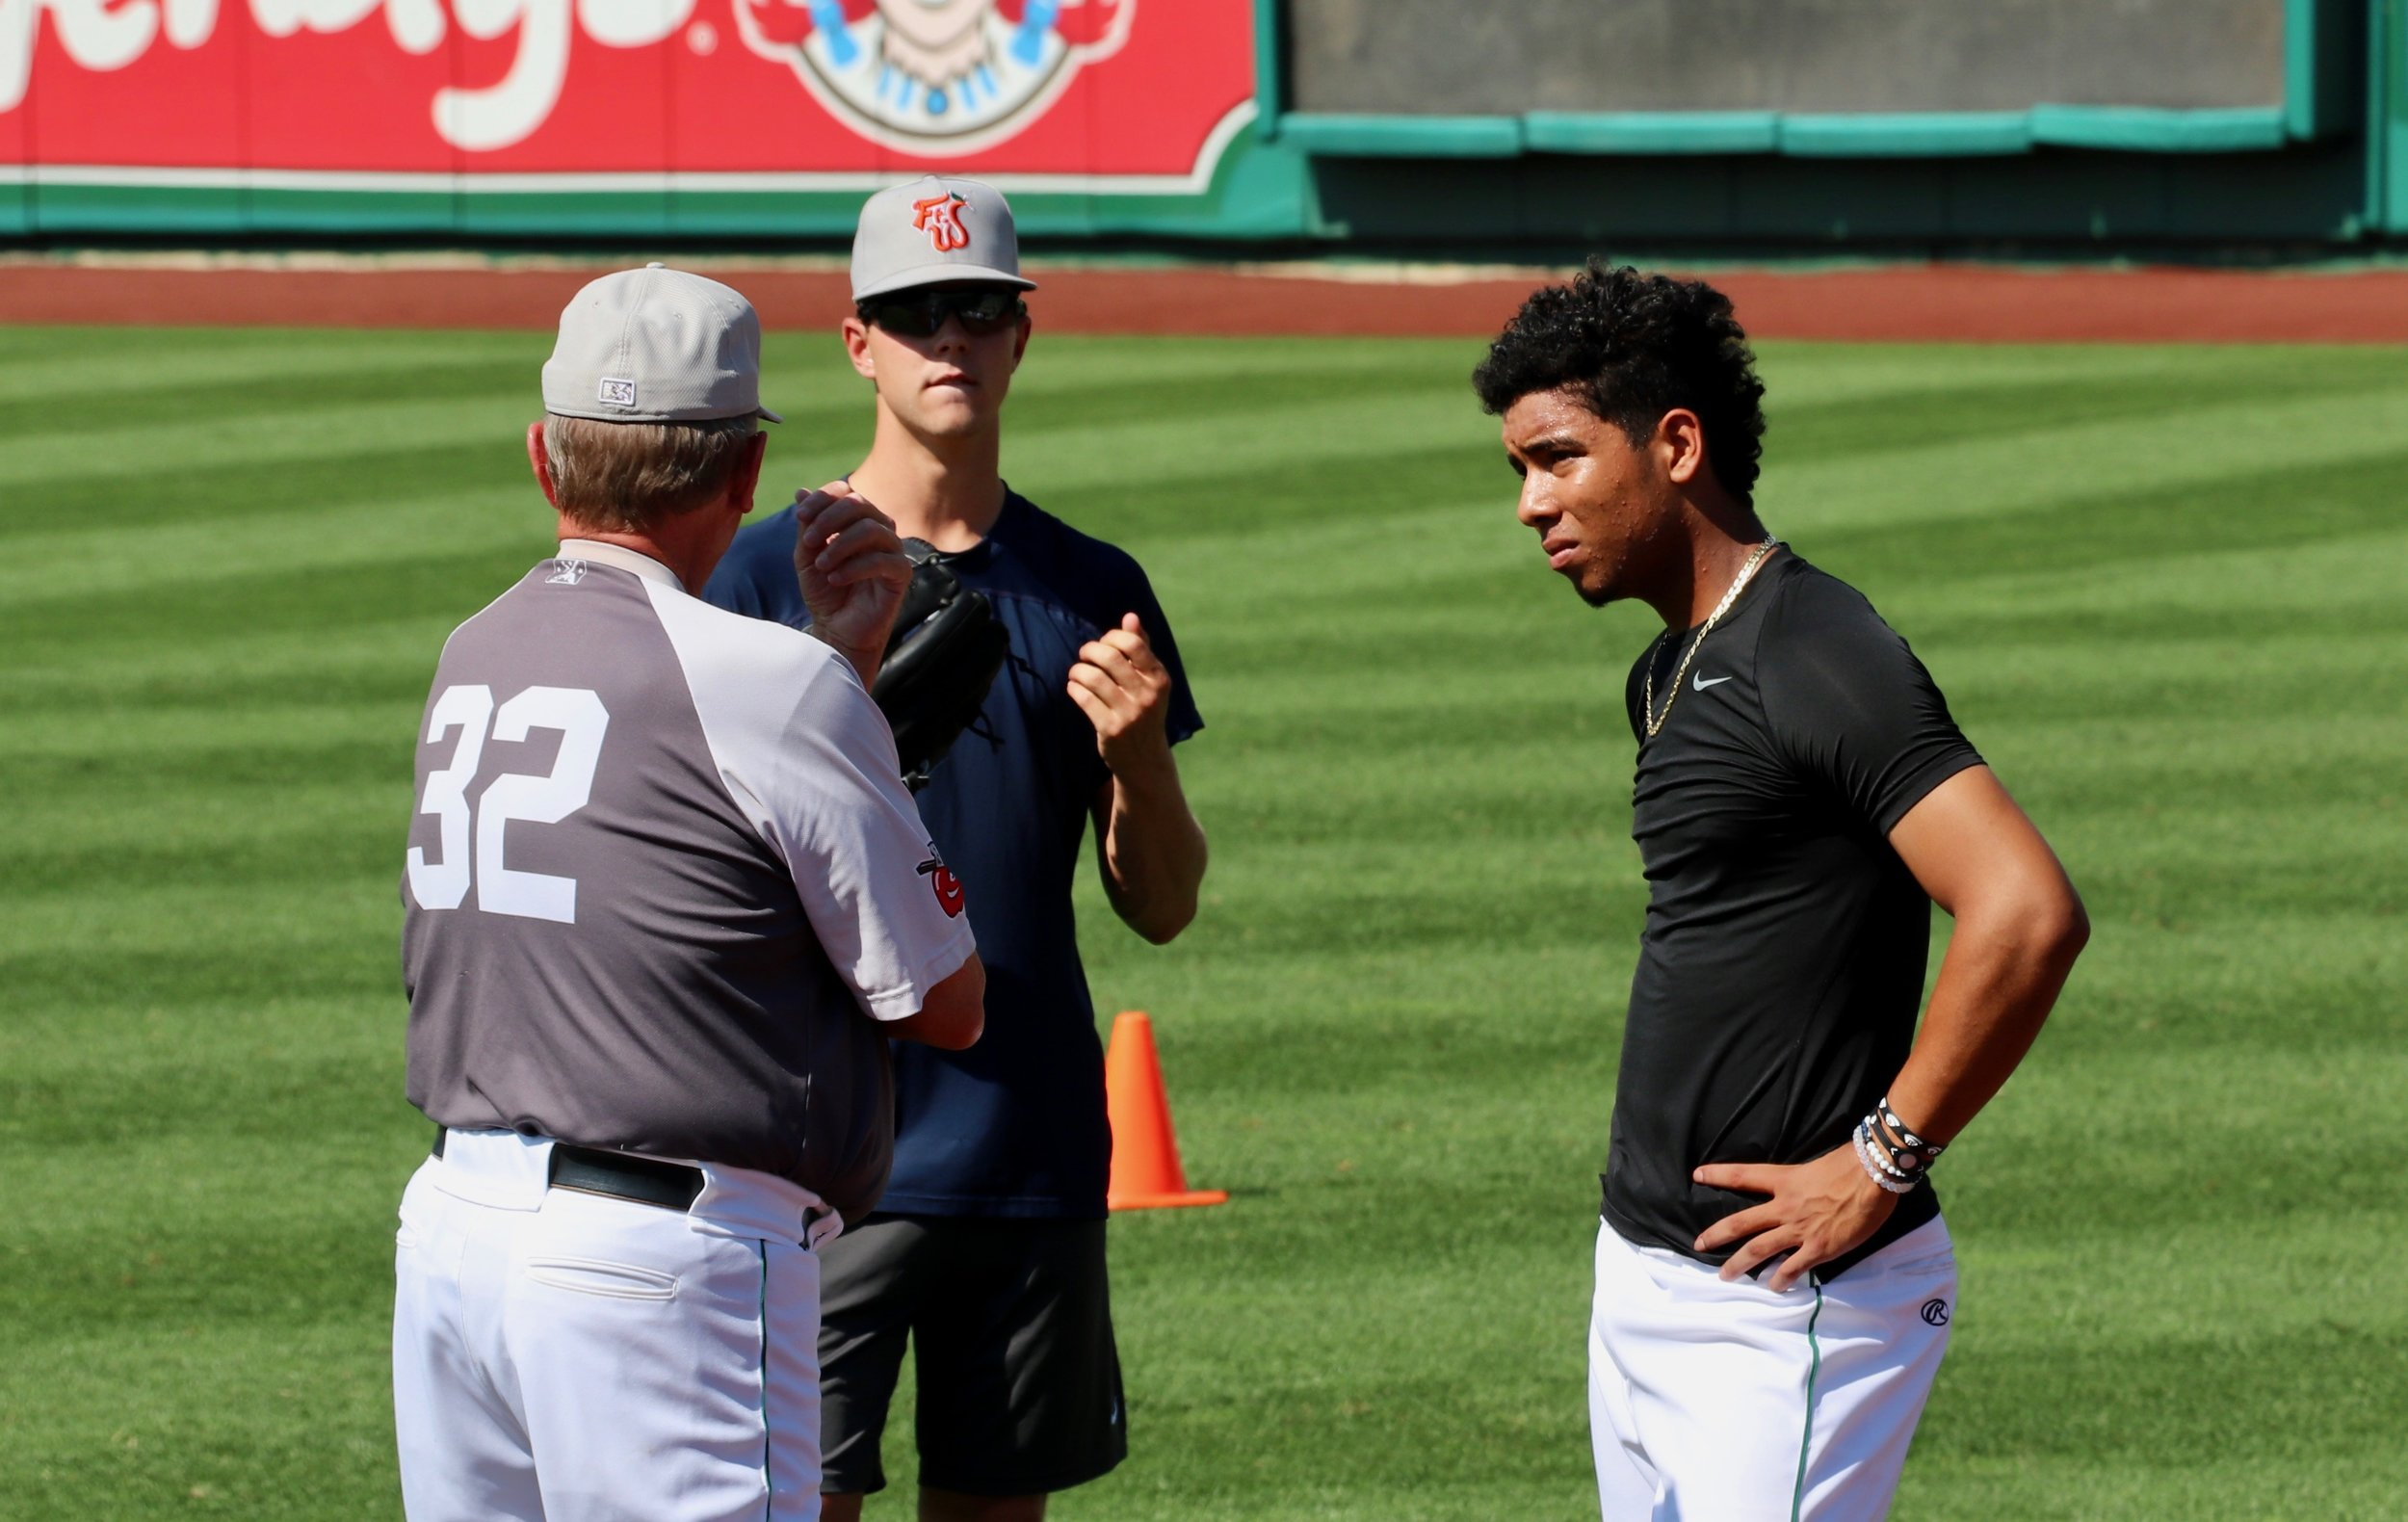 August 4, 2018. Burt Hooton, MacKenzie Gore and Luis Patiño (left to right) talk after Patiño's bullpen. Photo credit: Lance Brozdowski